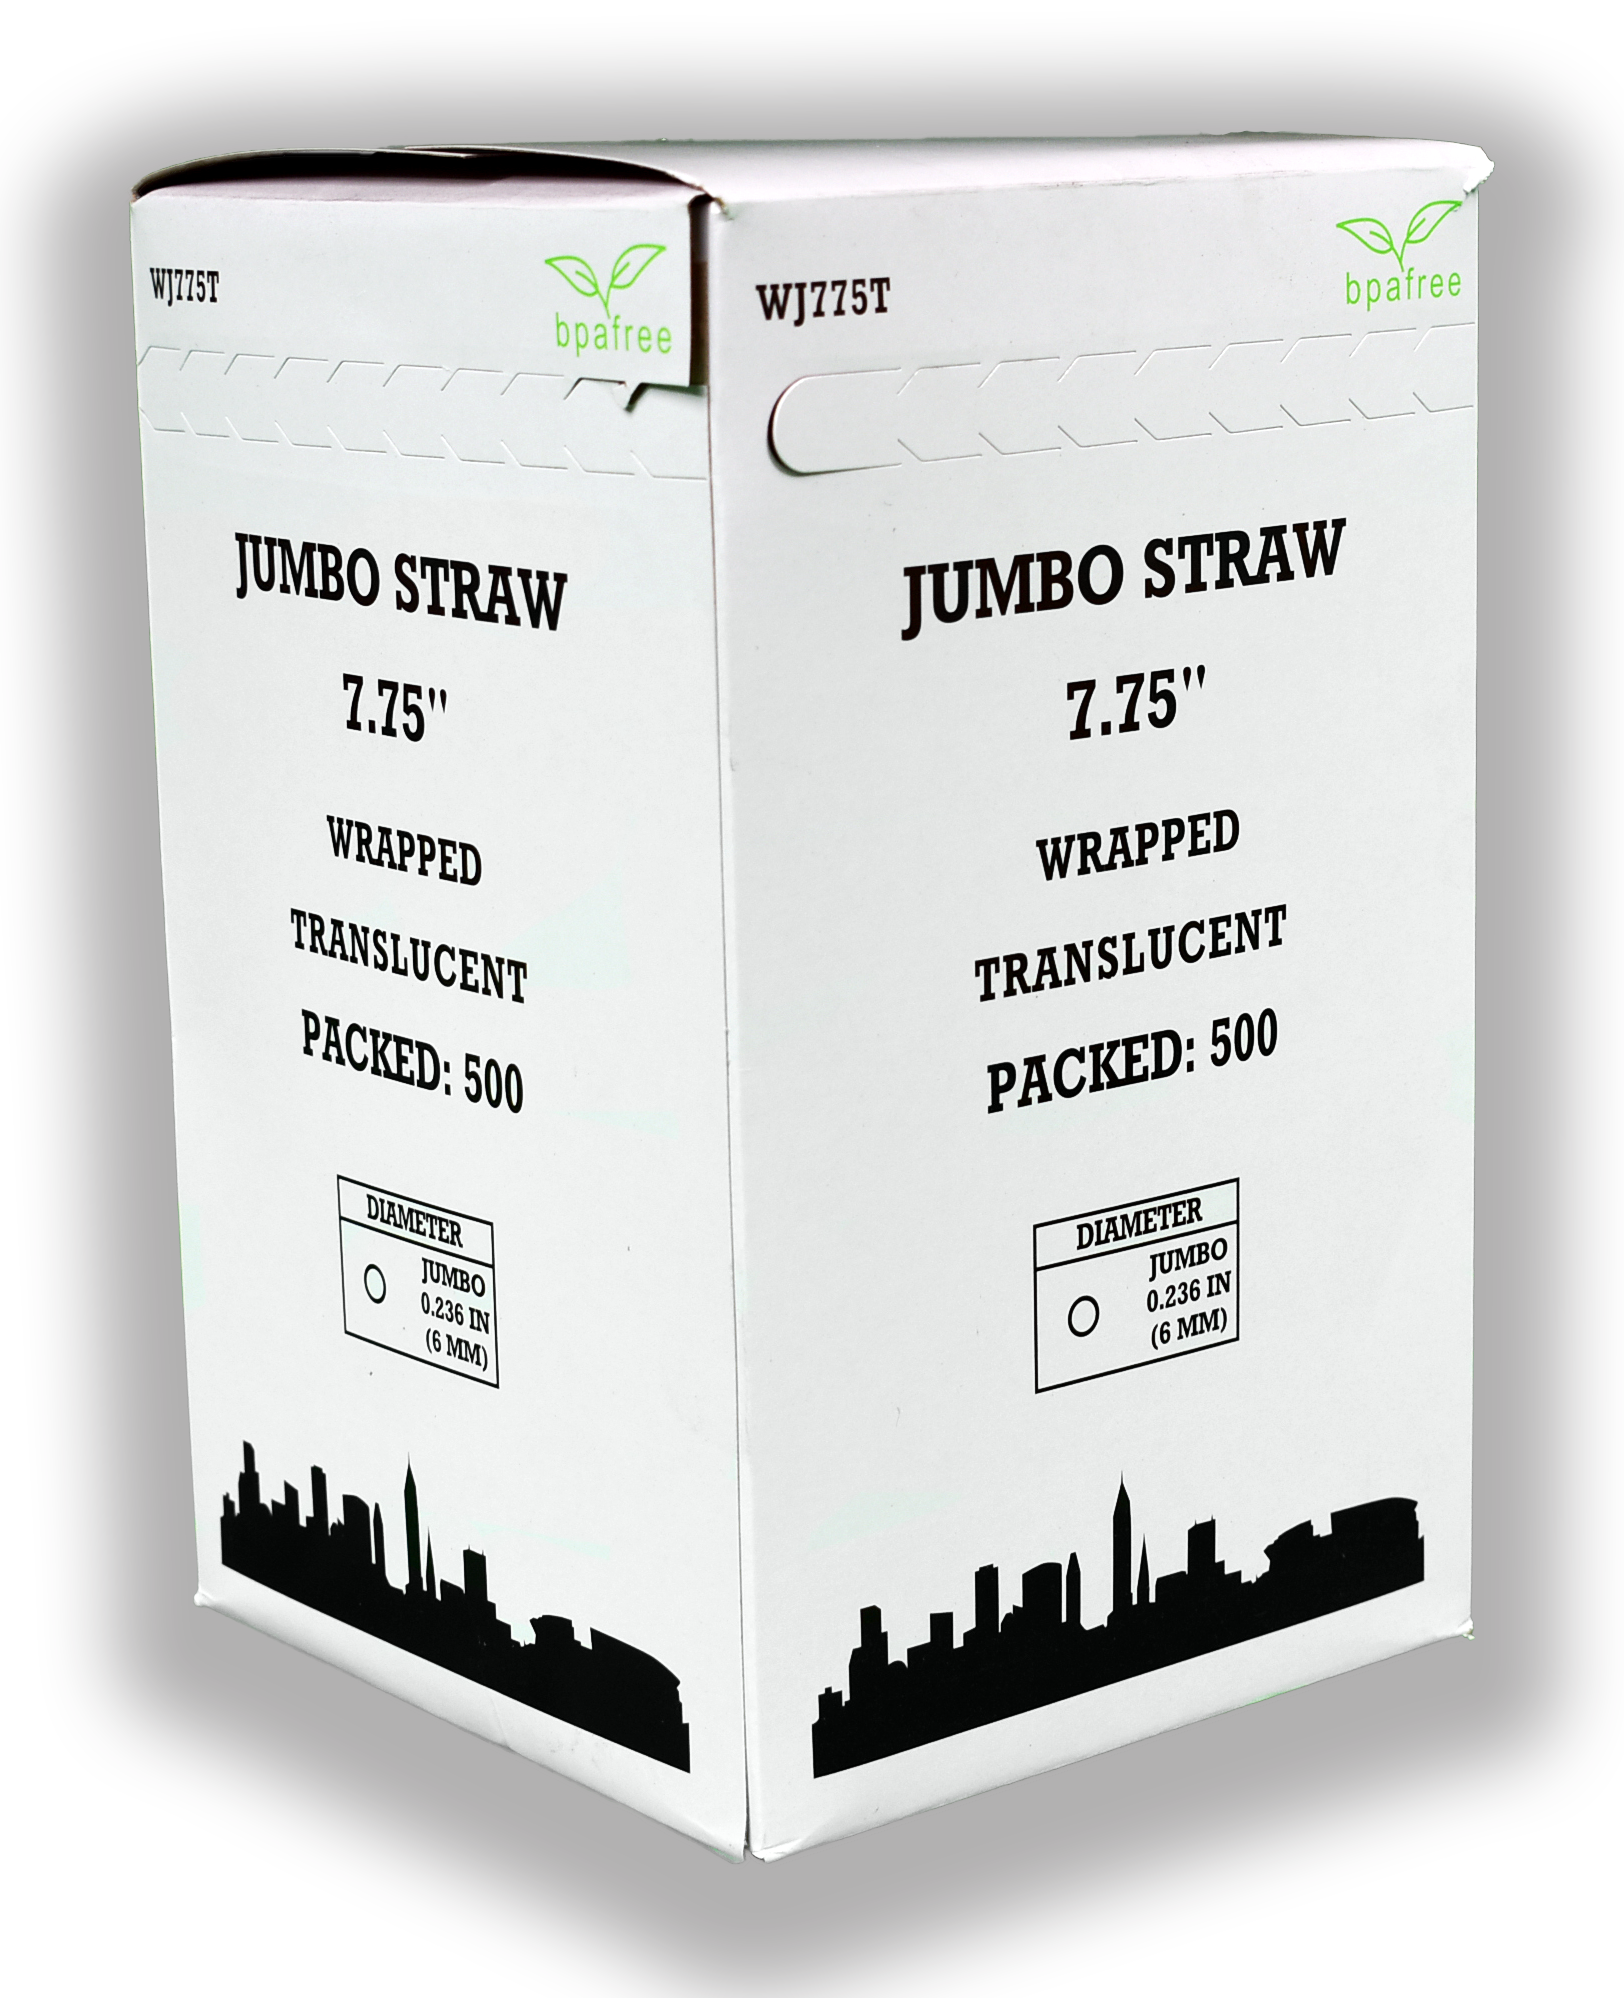 WRAP JUMBO STRAW 7-3/4